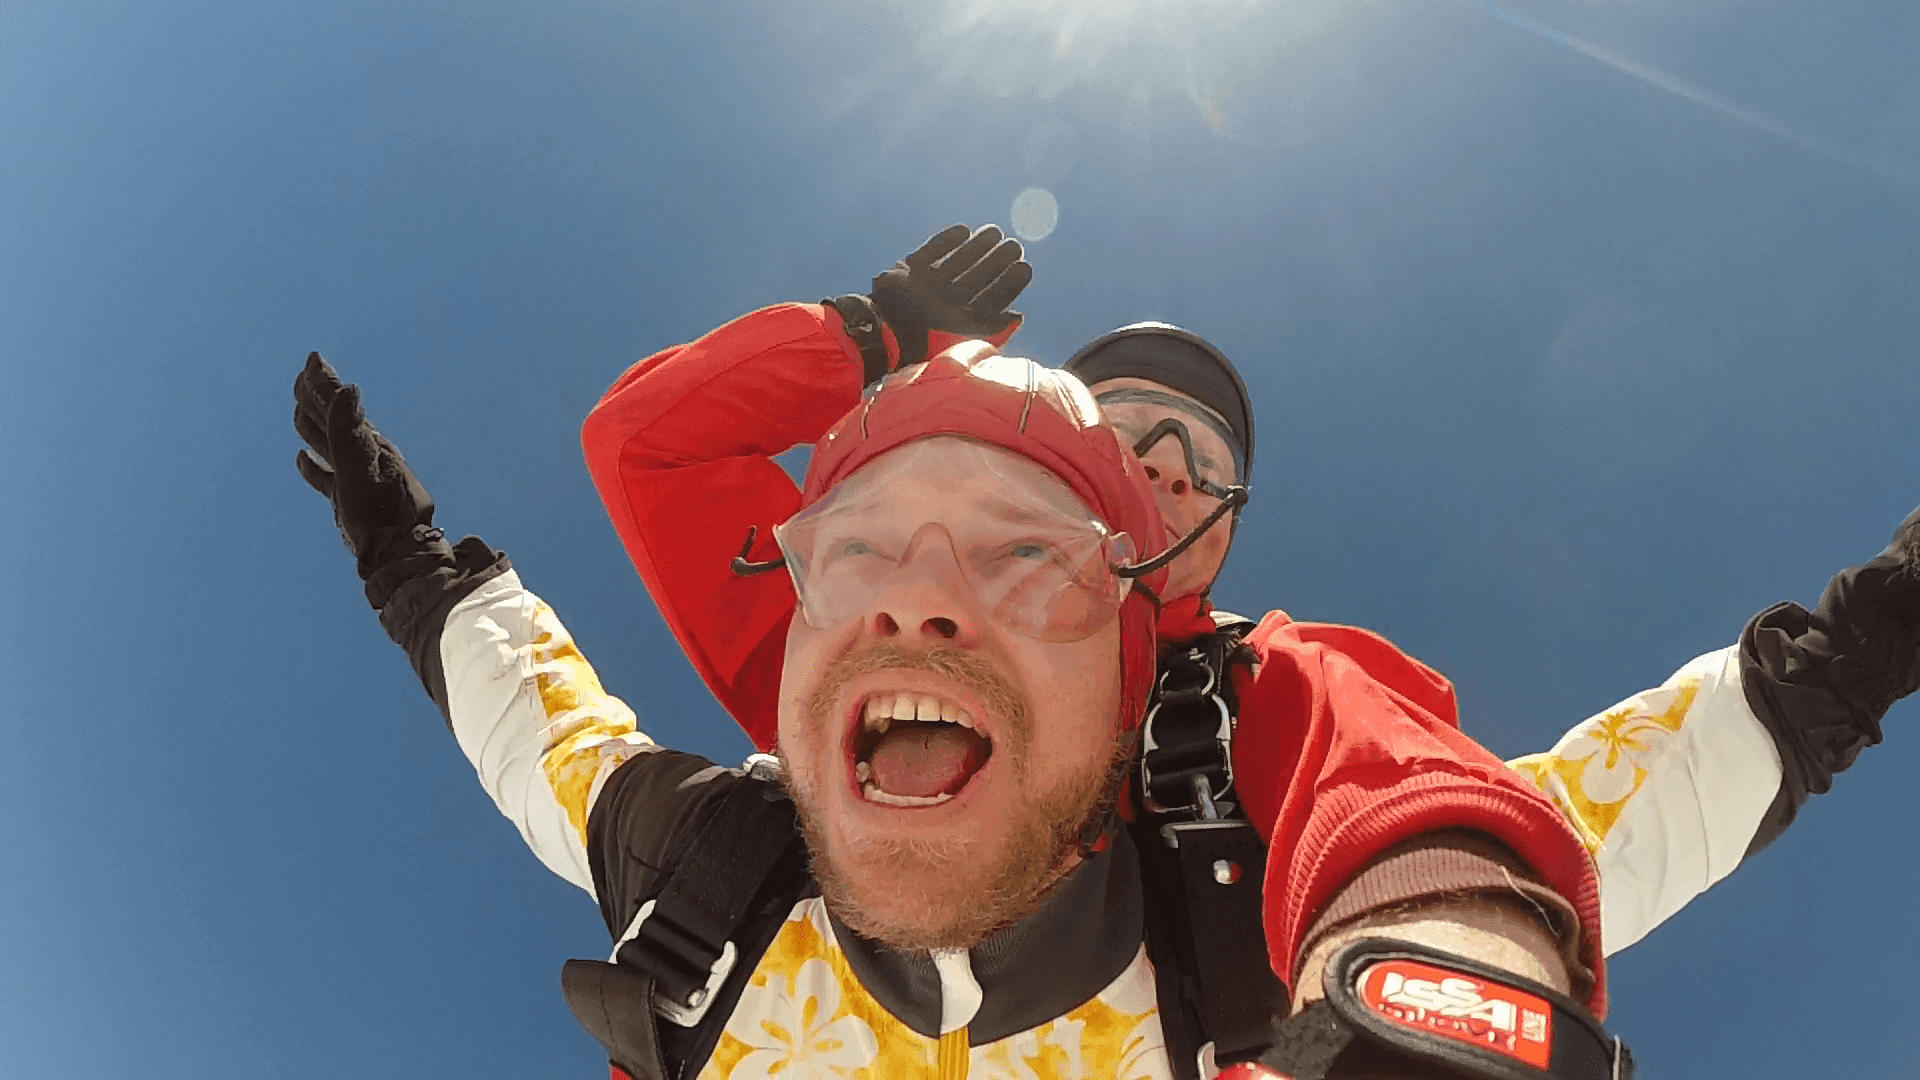 Fallschirmspringen Wernberg Köblitz Tandemsprung